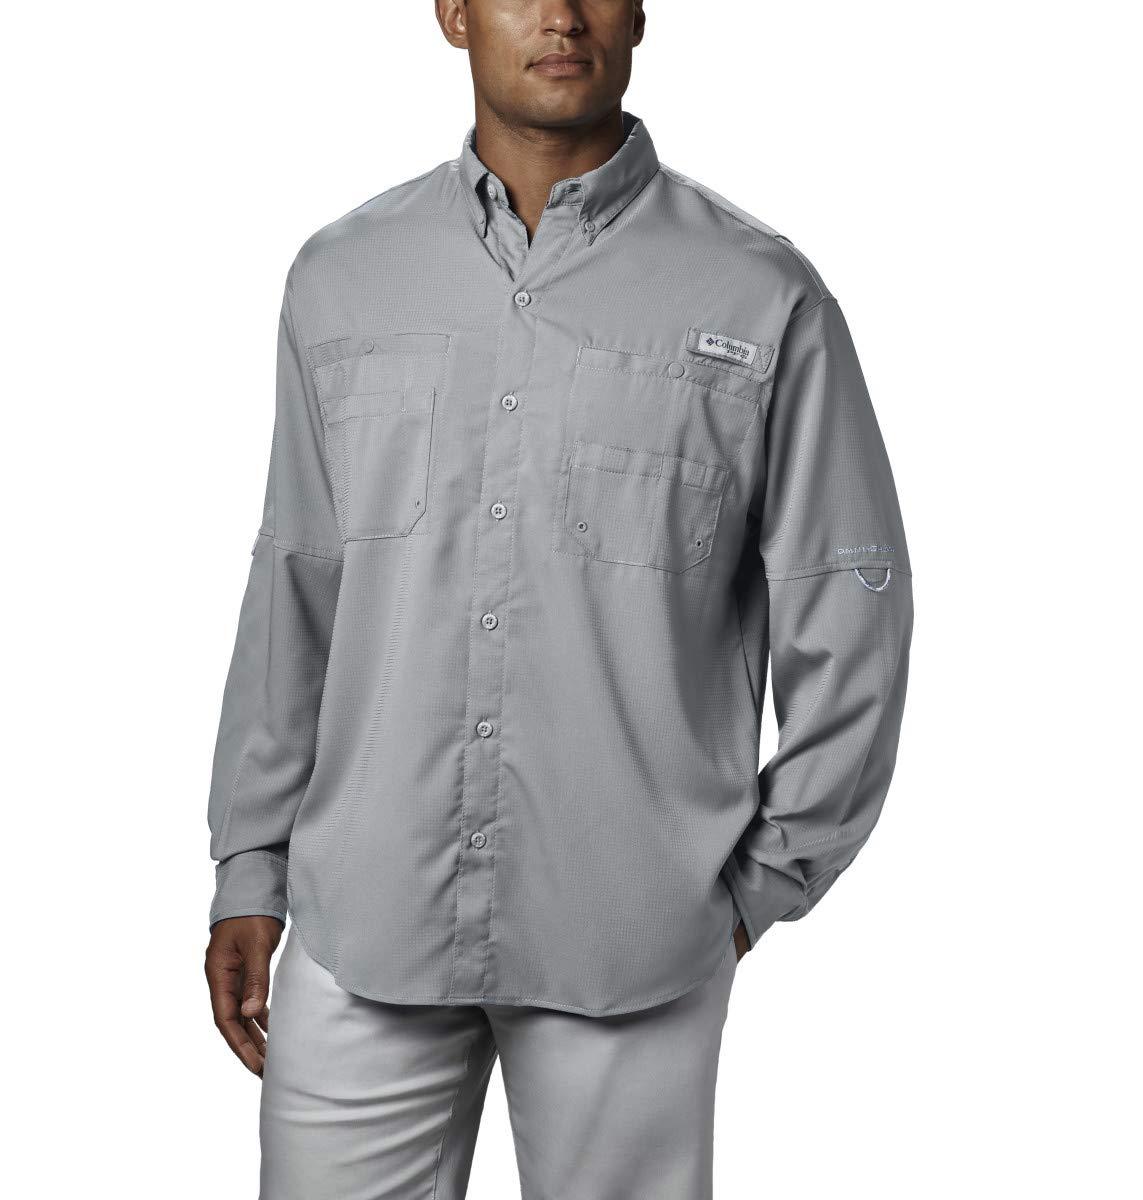 Columbia Men's PFG Tamiami II Long Sleeve Shirt , Cool Grey, Medium by Columbia